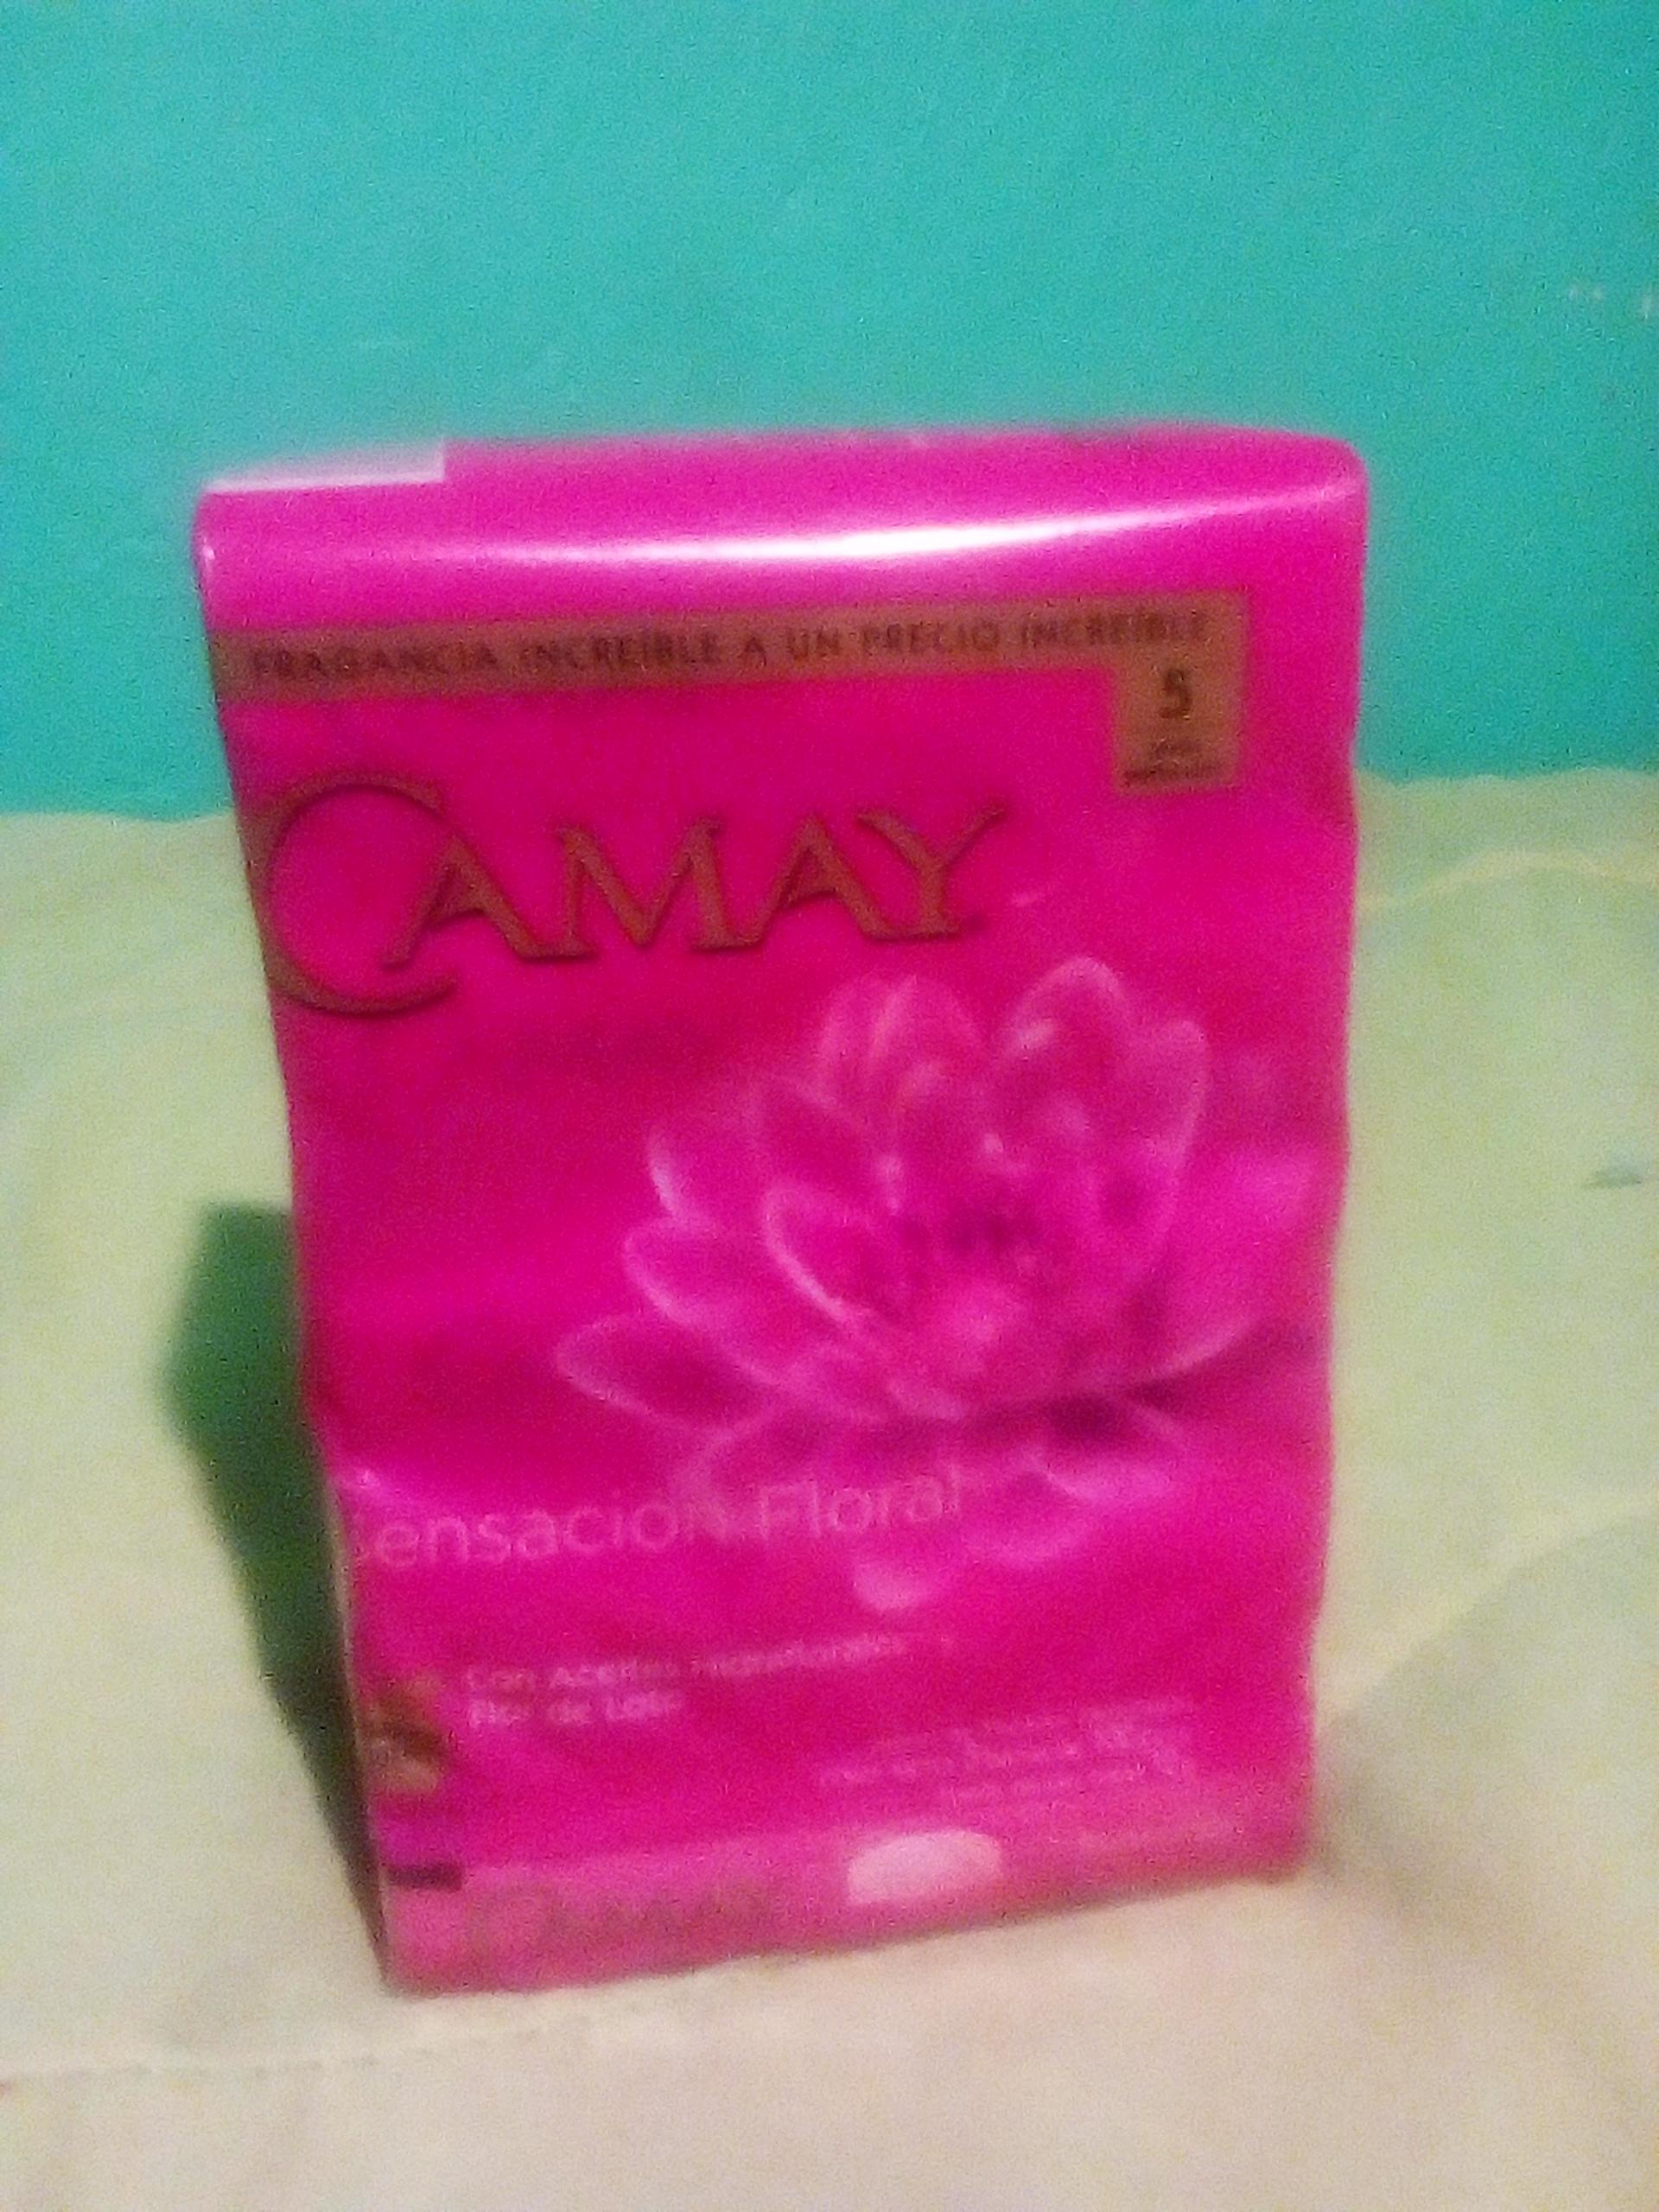 Bodega Aurrerá: jabon camay $7.02